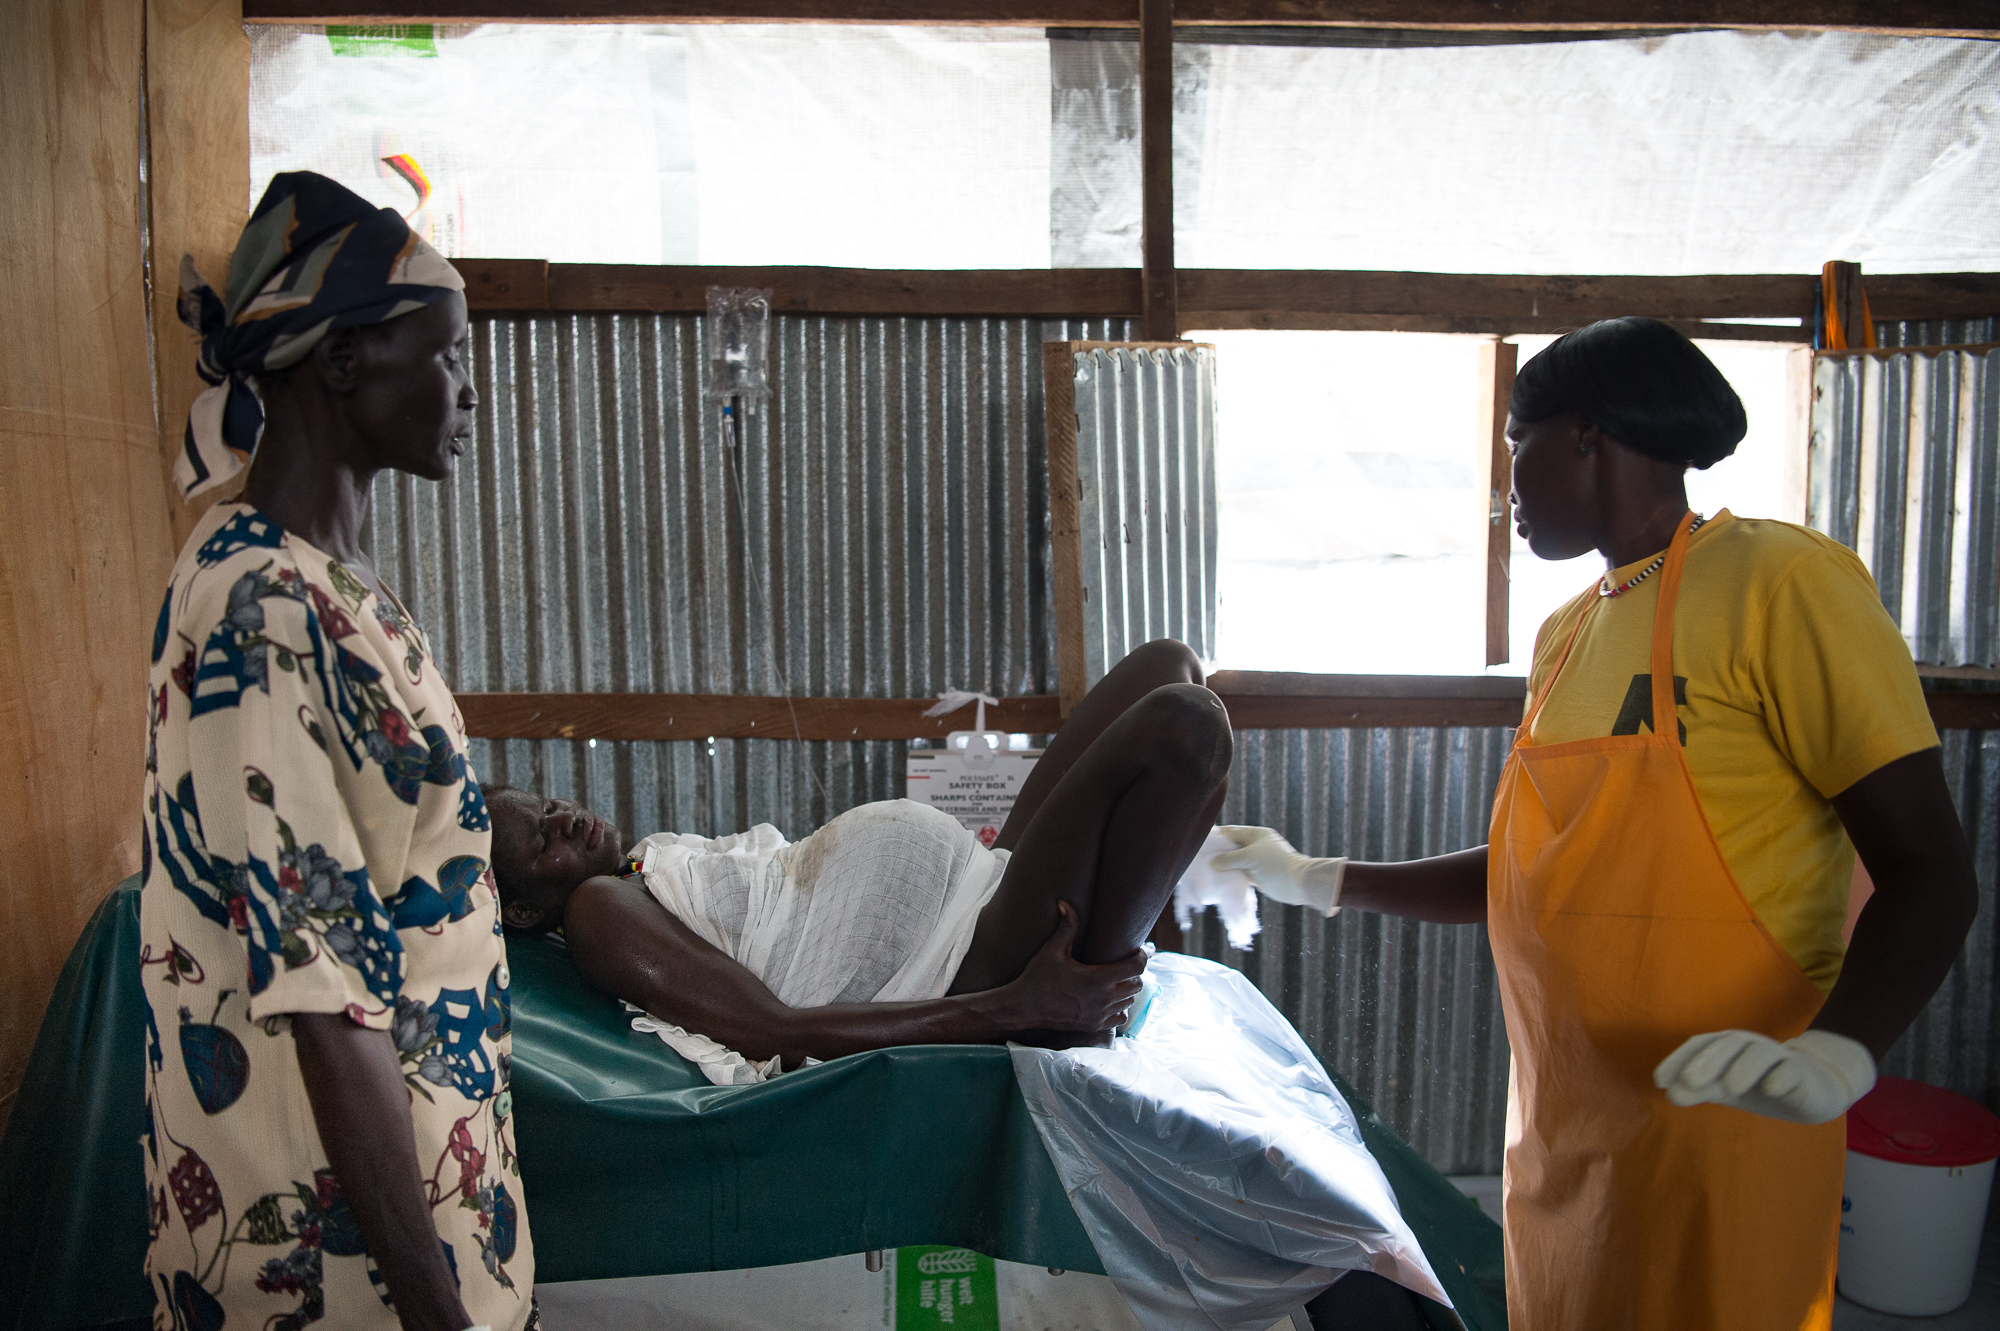 AE_SS16_UNICEF__0023.jpg